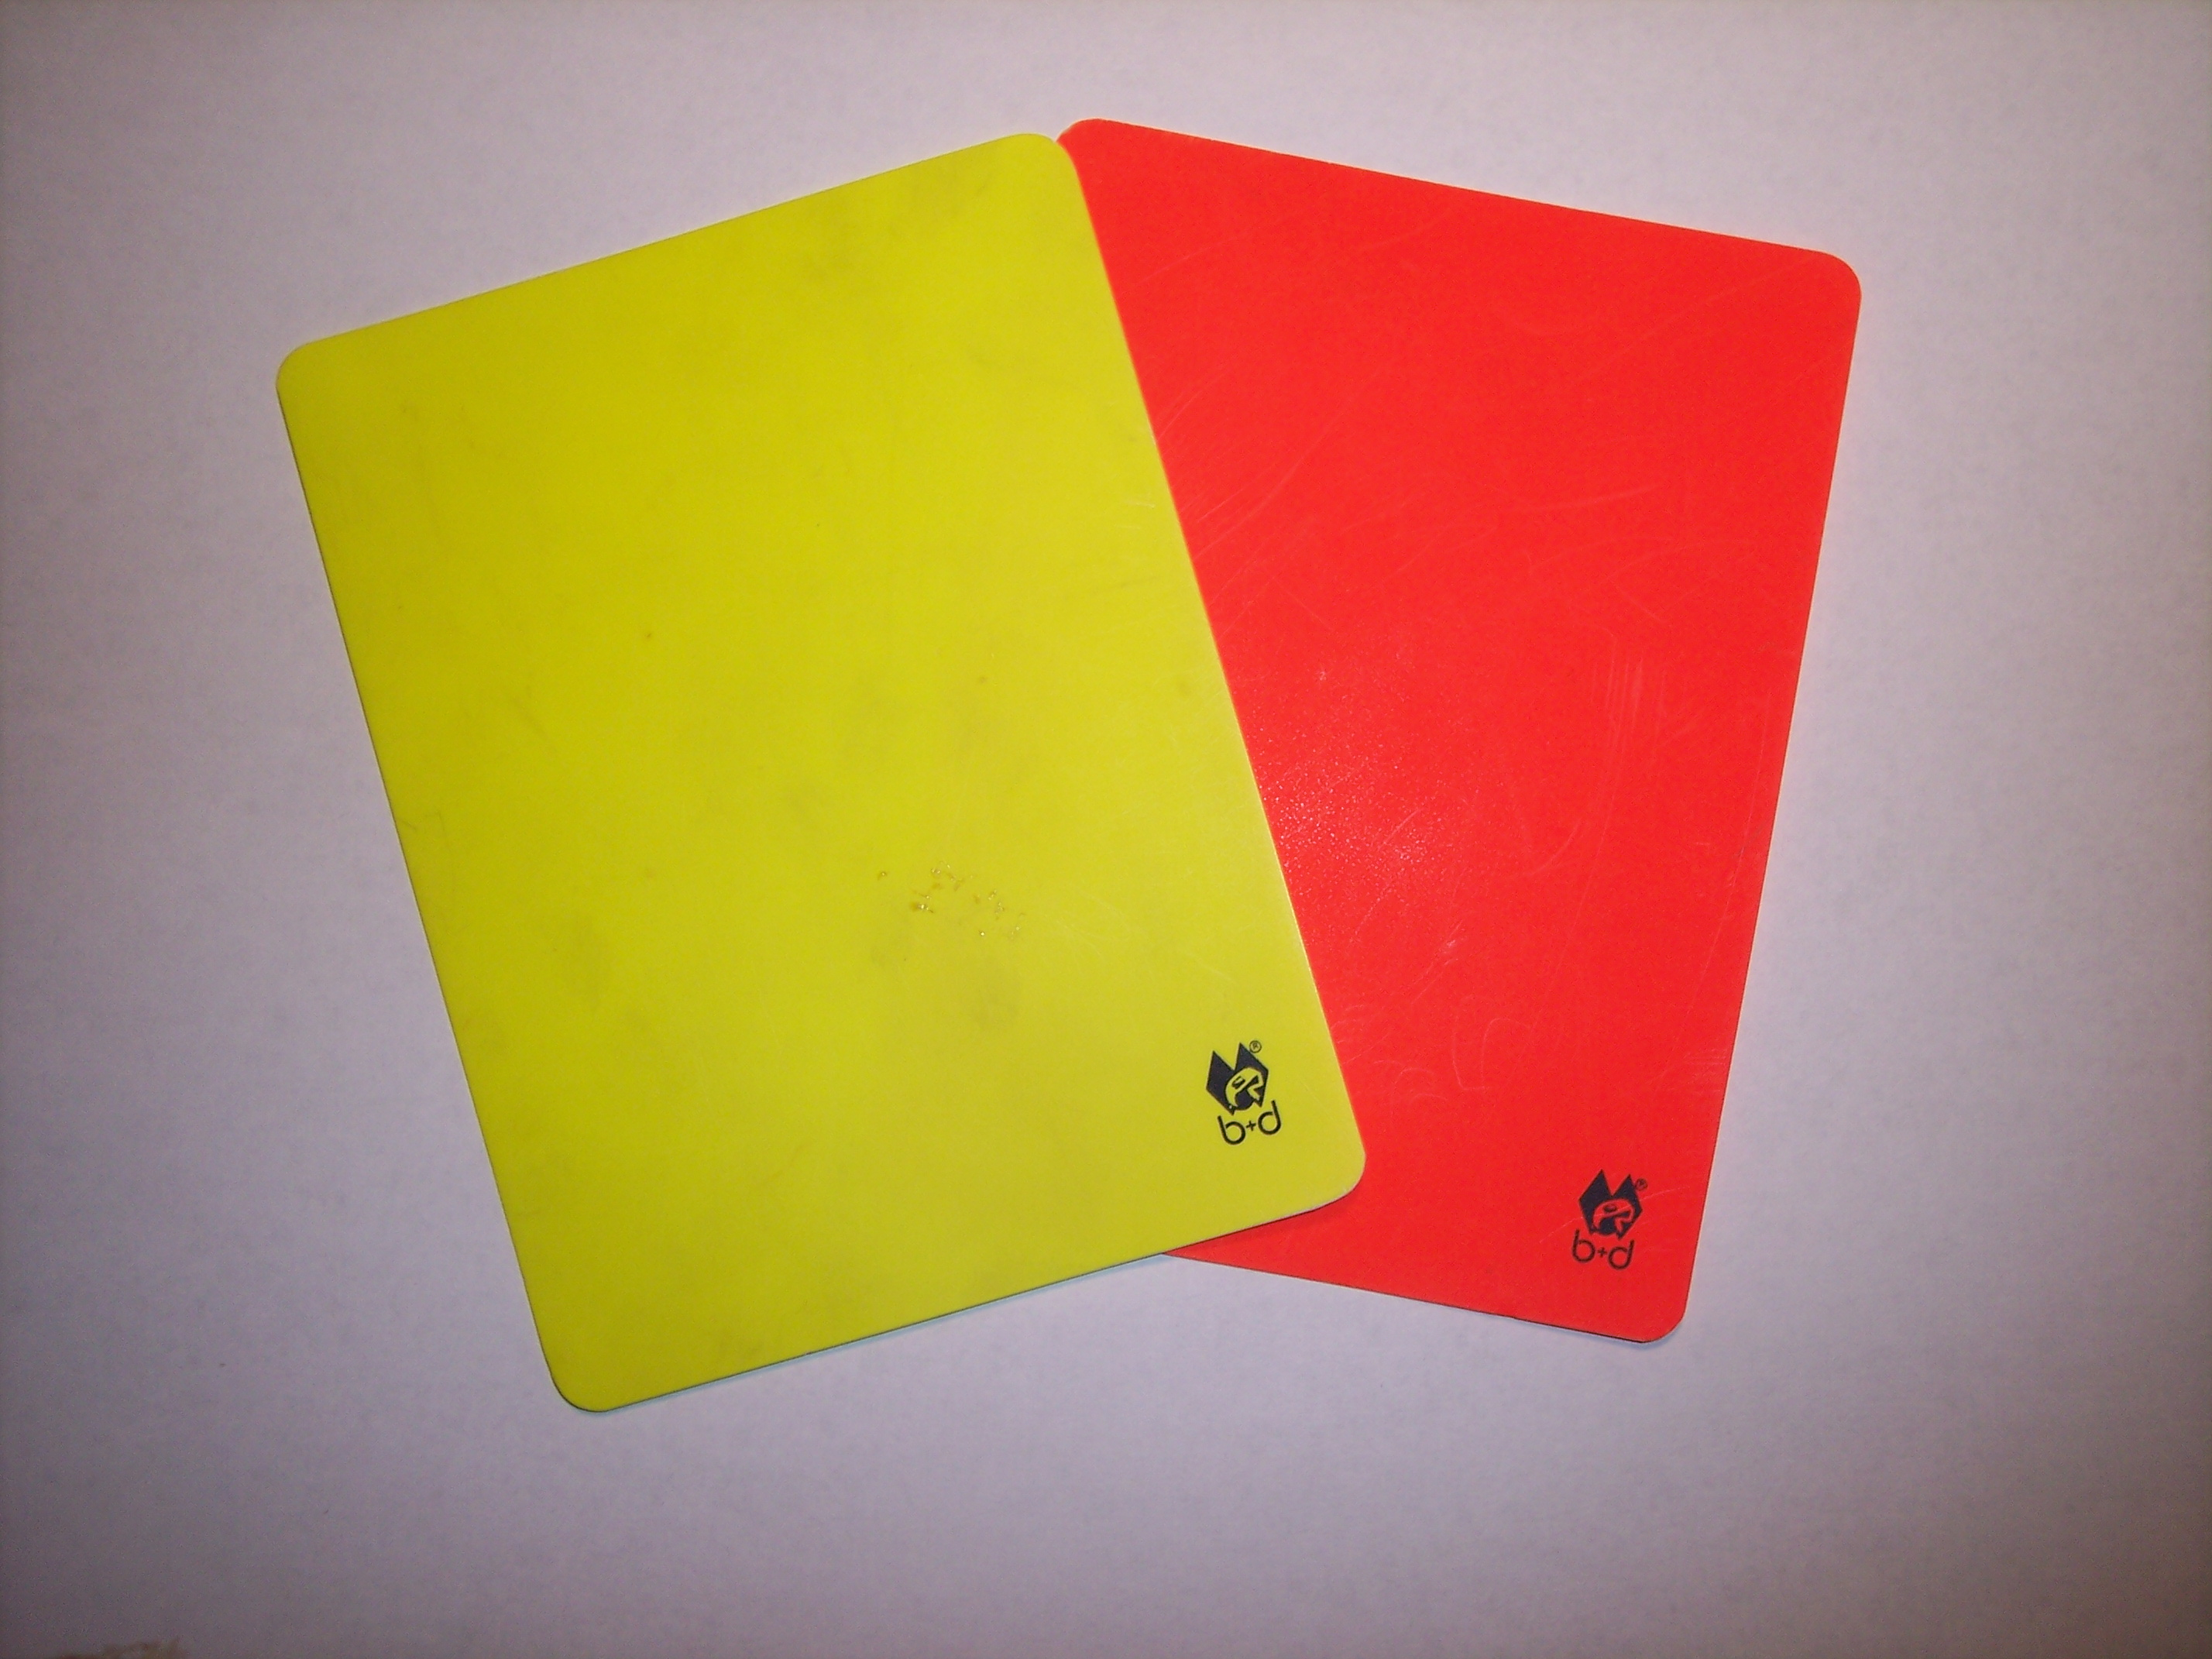 Gelb Rote Karte Wikipedia